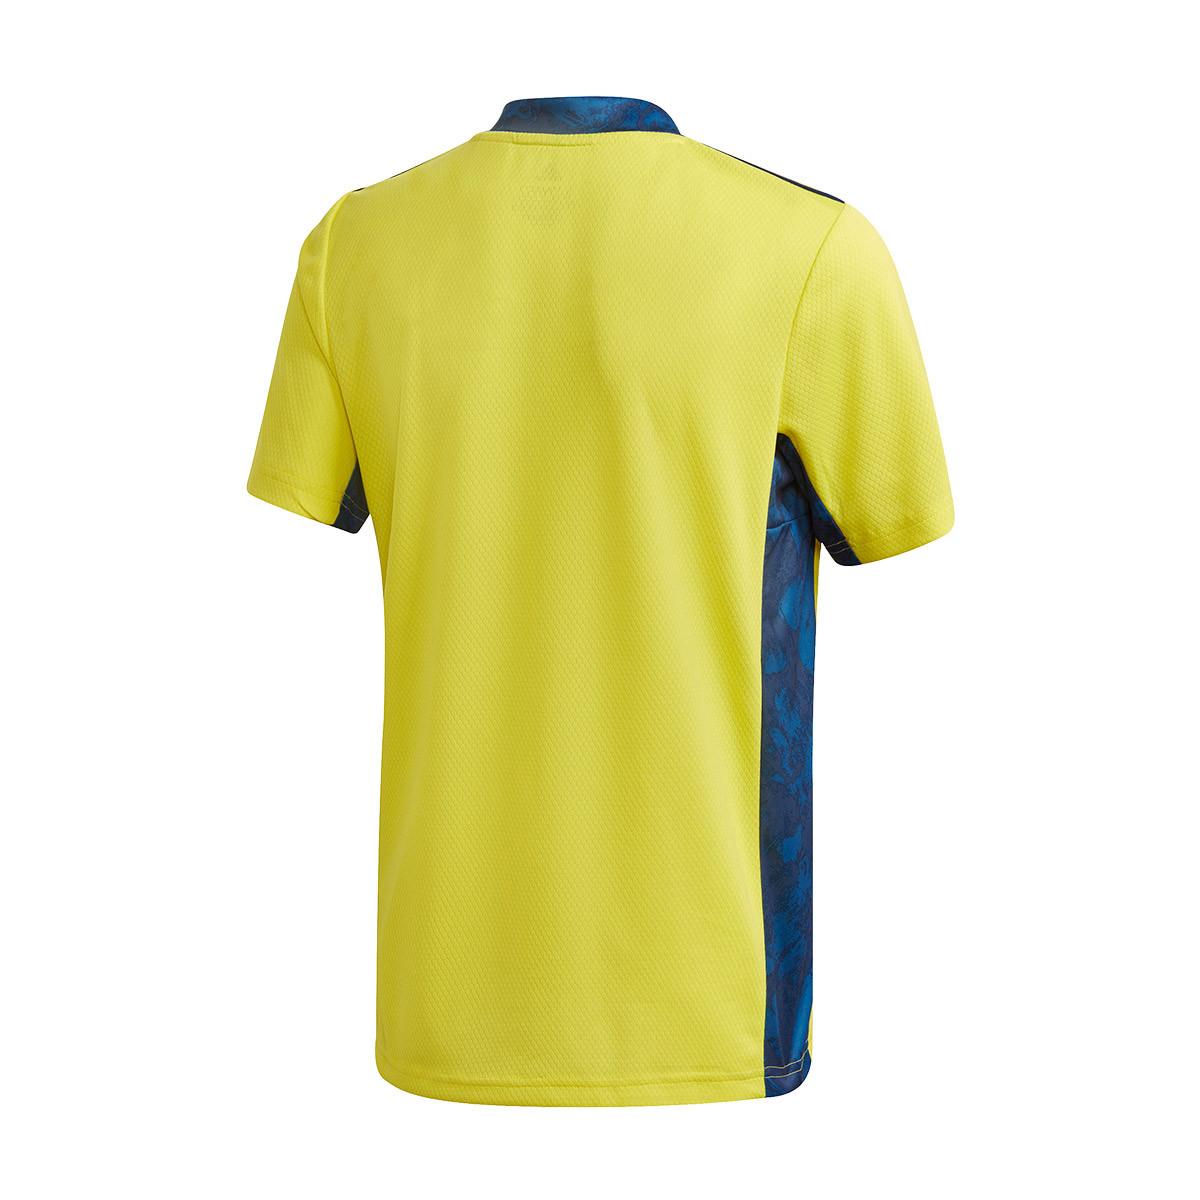 Jersey Adidas Juventus Portero Primera Equipacion 2020 2021 Nino Shock Yellow Team Navy Blue Football Store Futbol Emotion